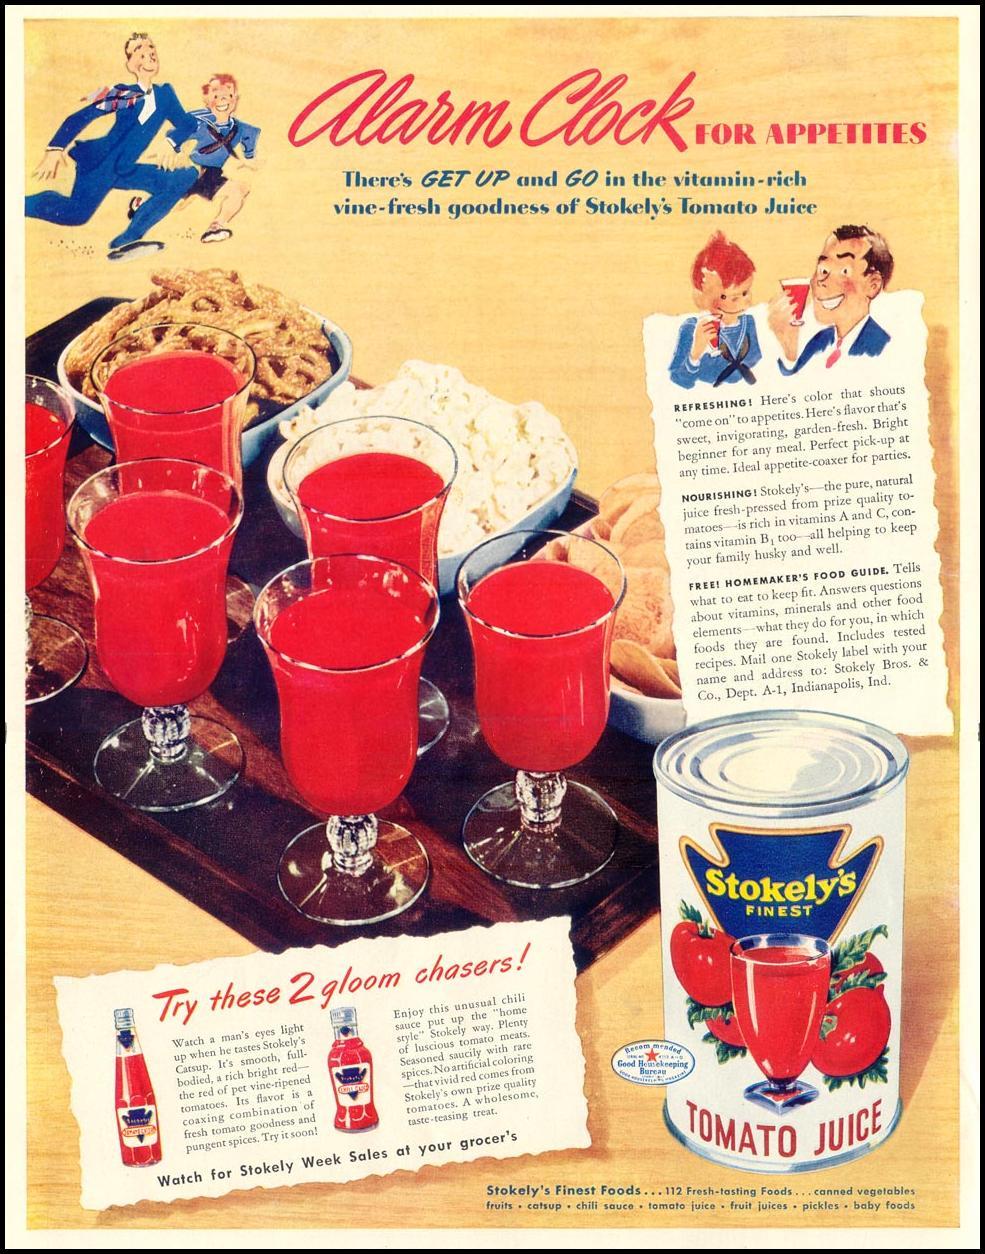 STOKELY'S FINEST TOMATO JUICE LIFE 10/13/1941